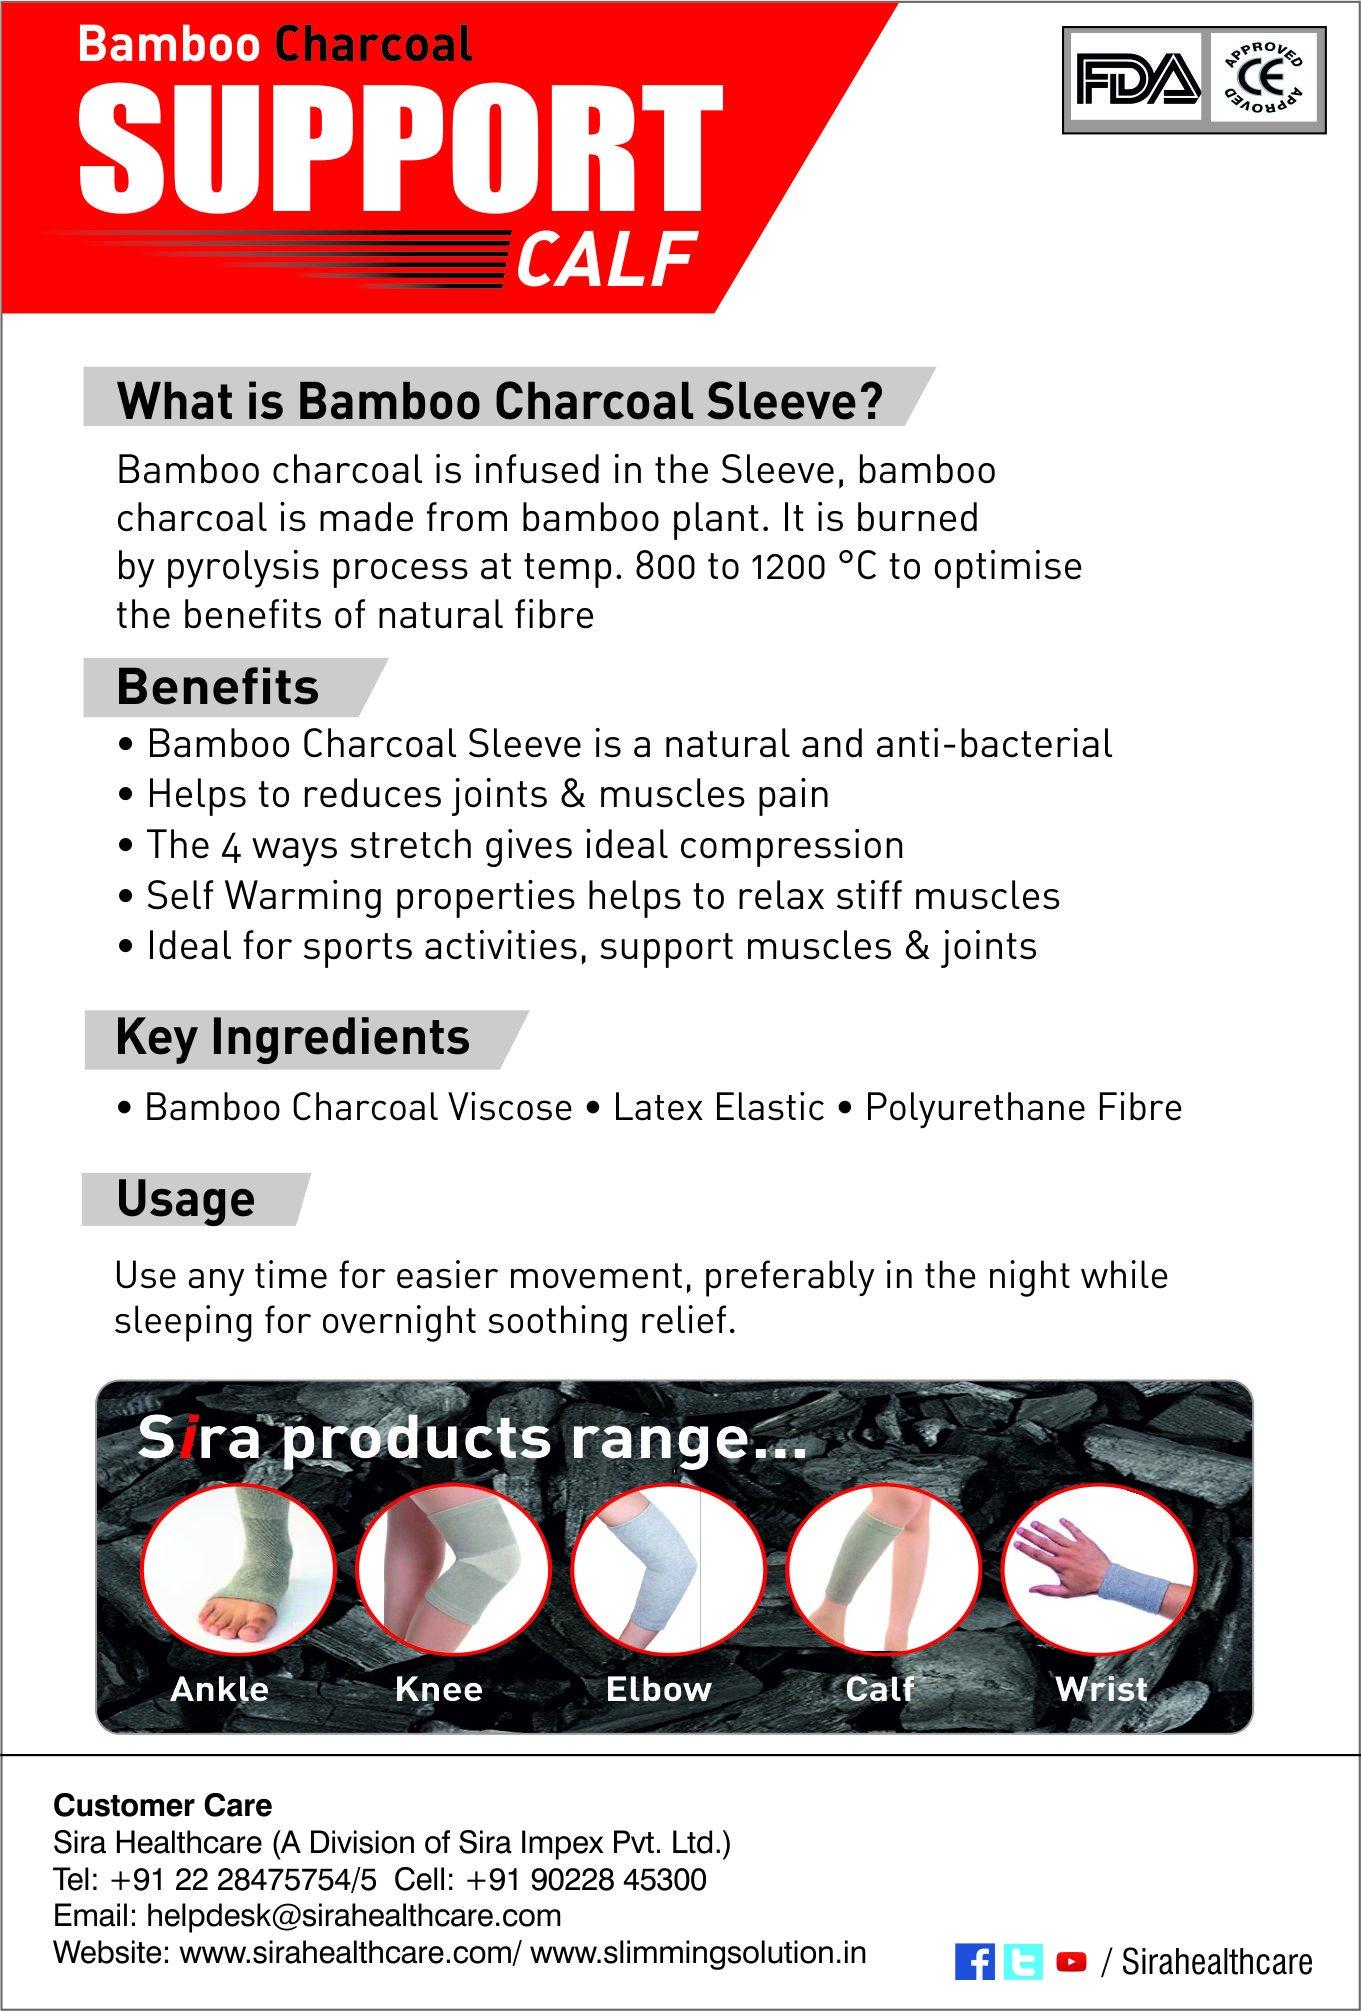 Sira Bamboo Charcoal Calf Sleeve,Outdoor Sports, Protector,Running,Calf Guard Shin Splints Sleeves,Great for Running,Baseball,Walking,Cycling,Training,Travel- Boosts Circulation - Aids Faster Recovery